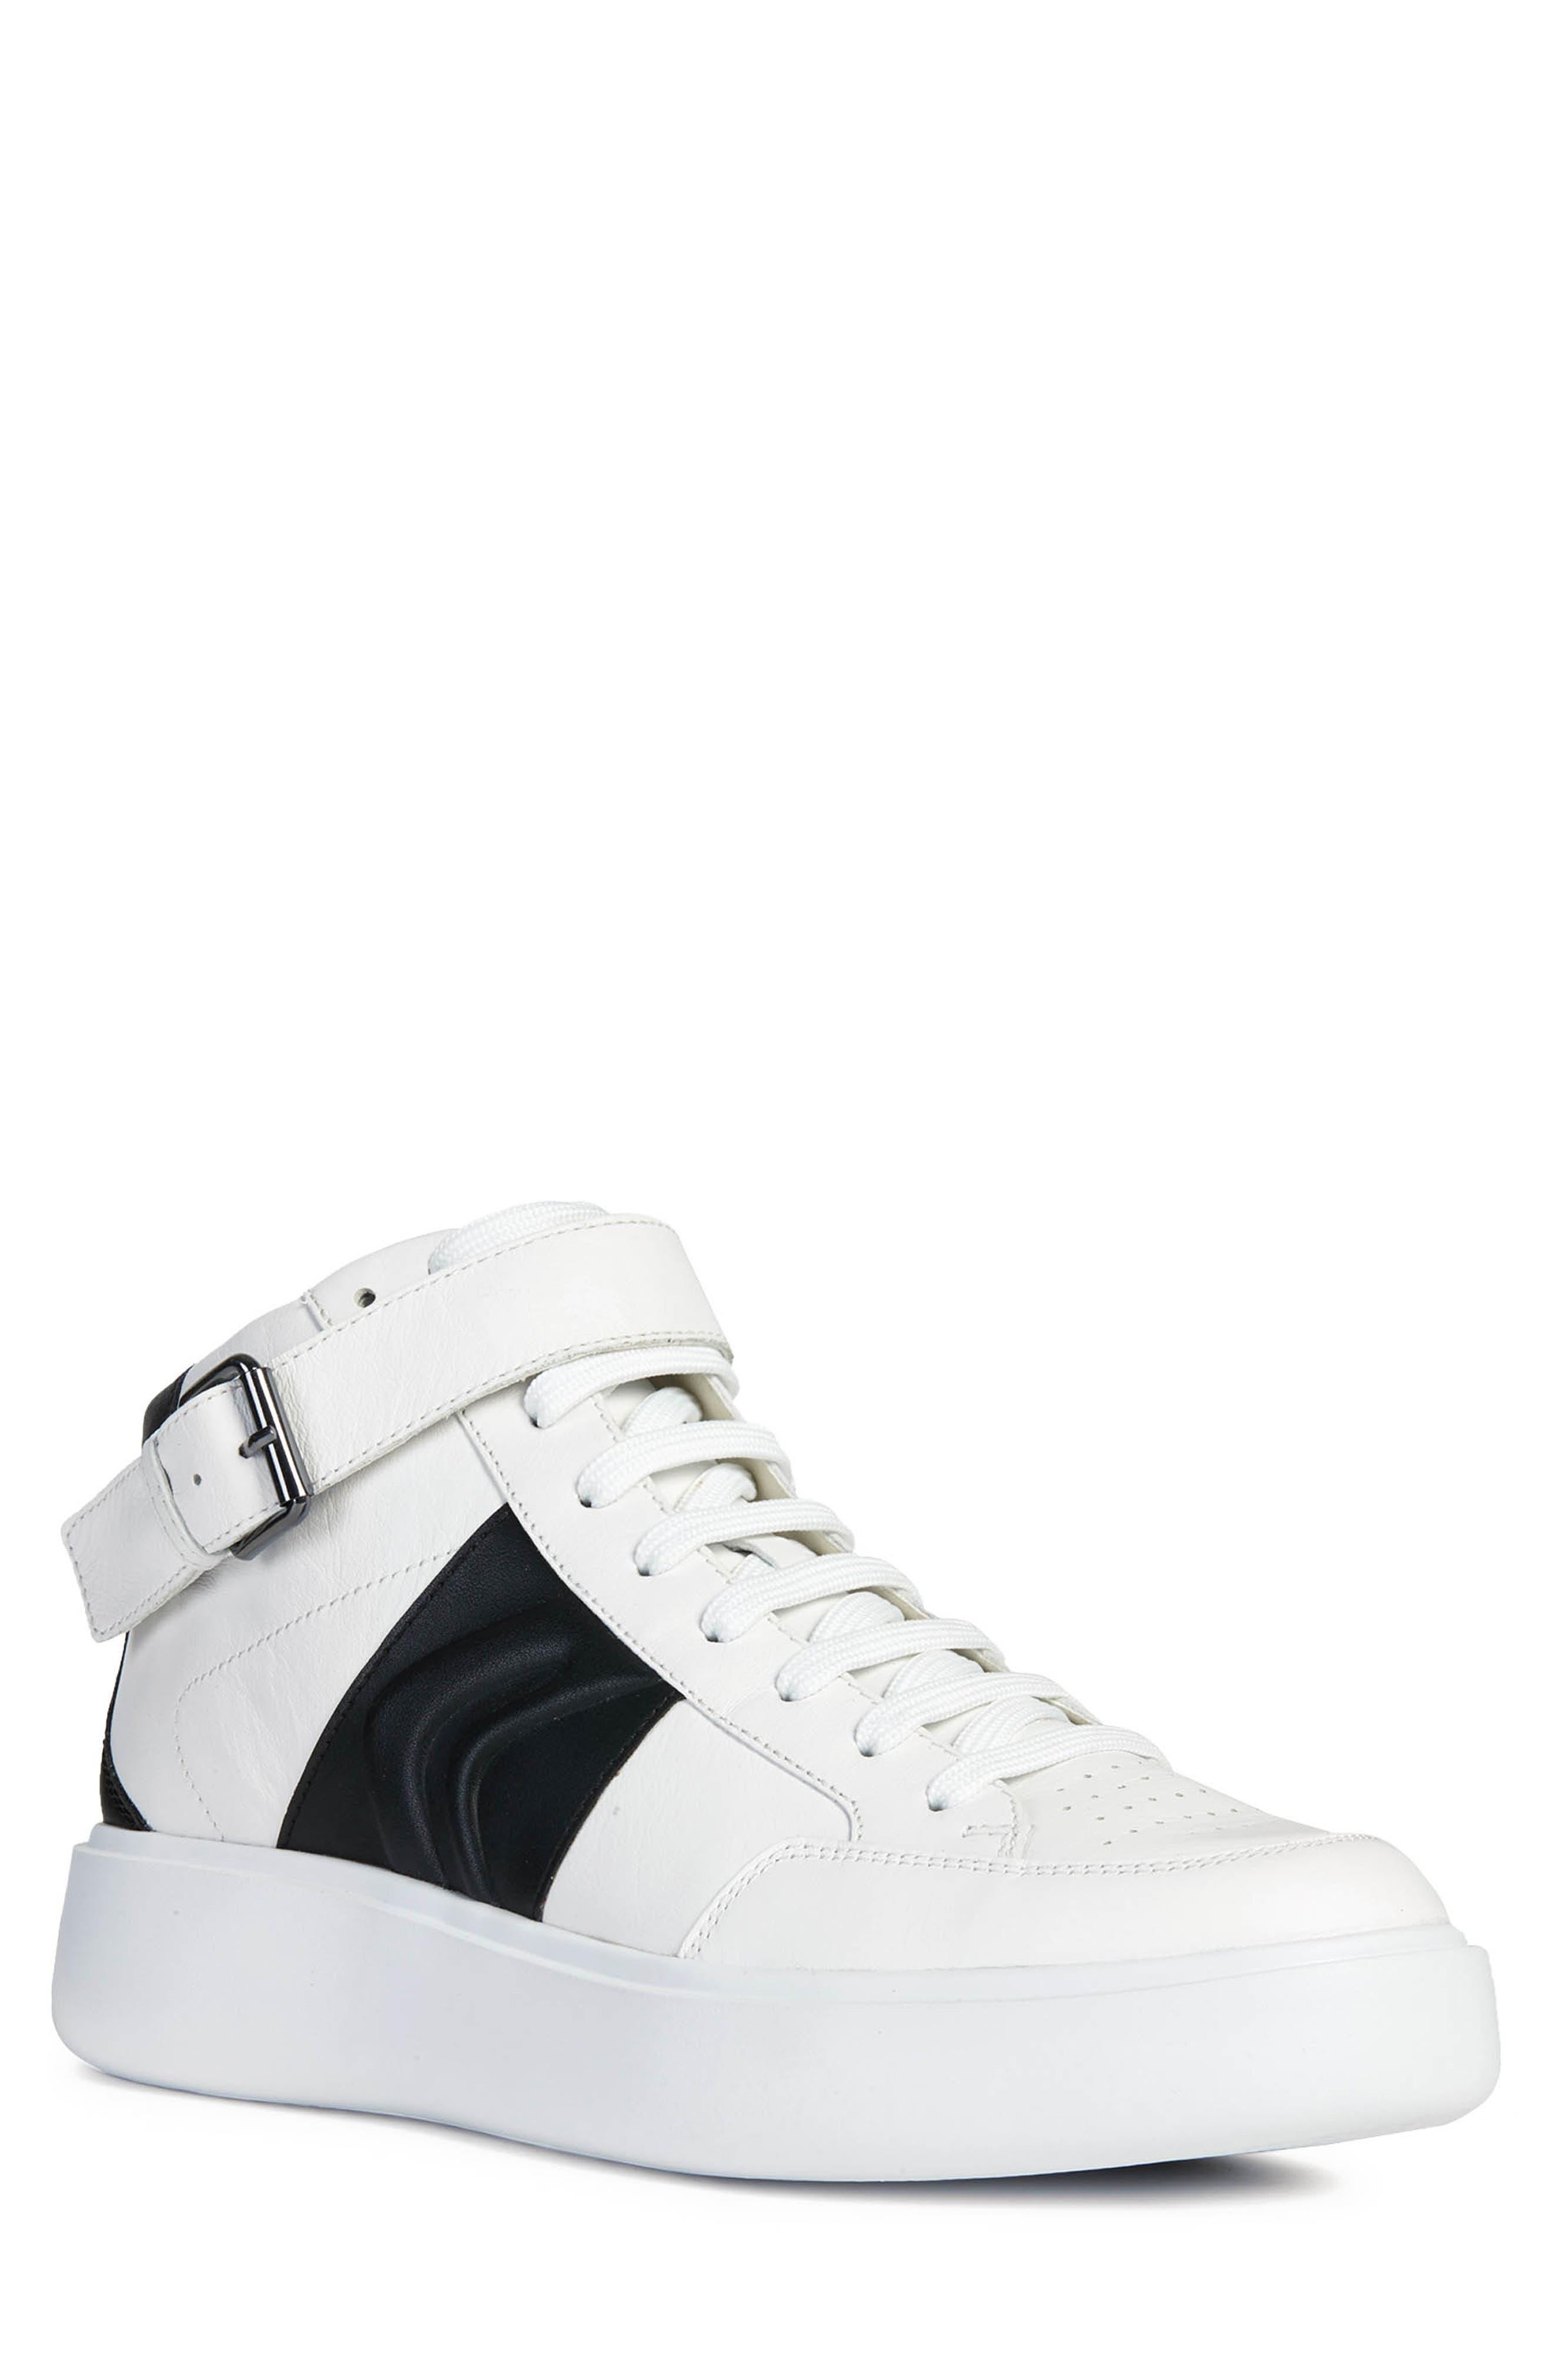 Geox Ottaya 2 High Top Sneaker, White